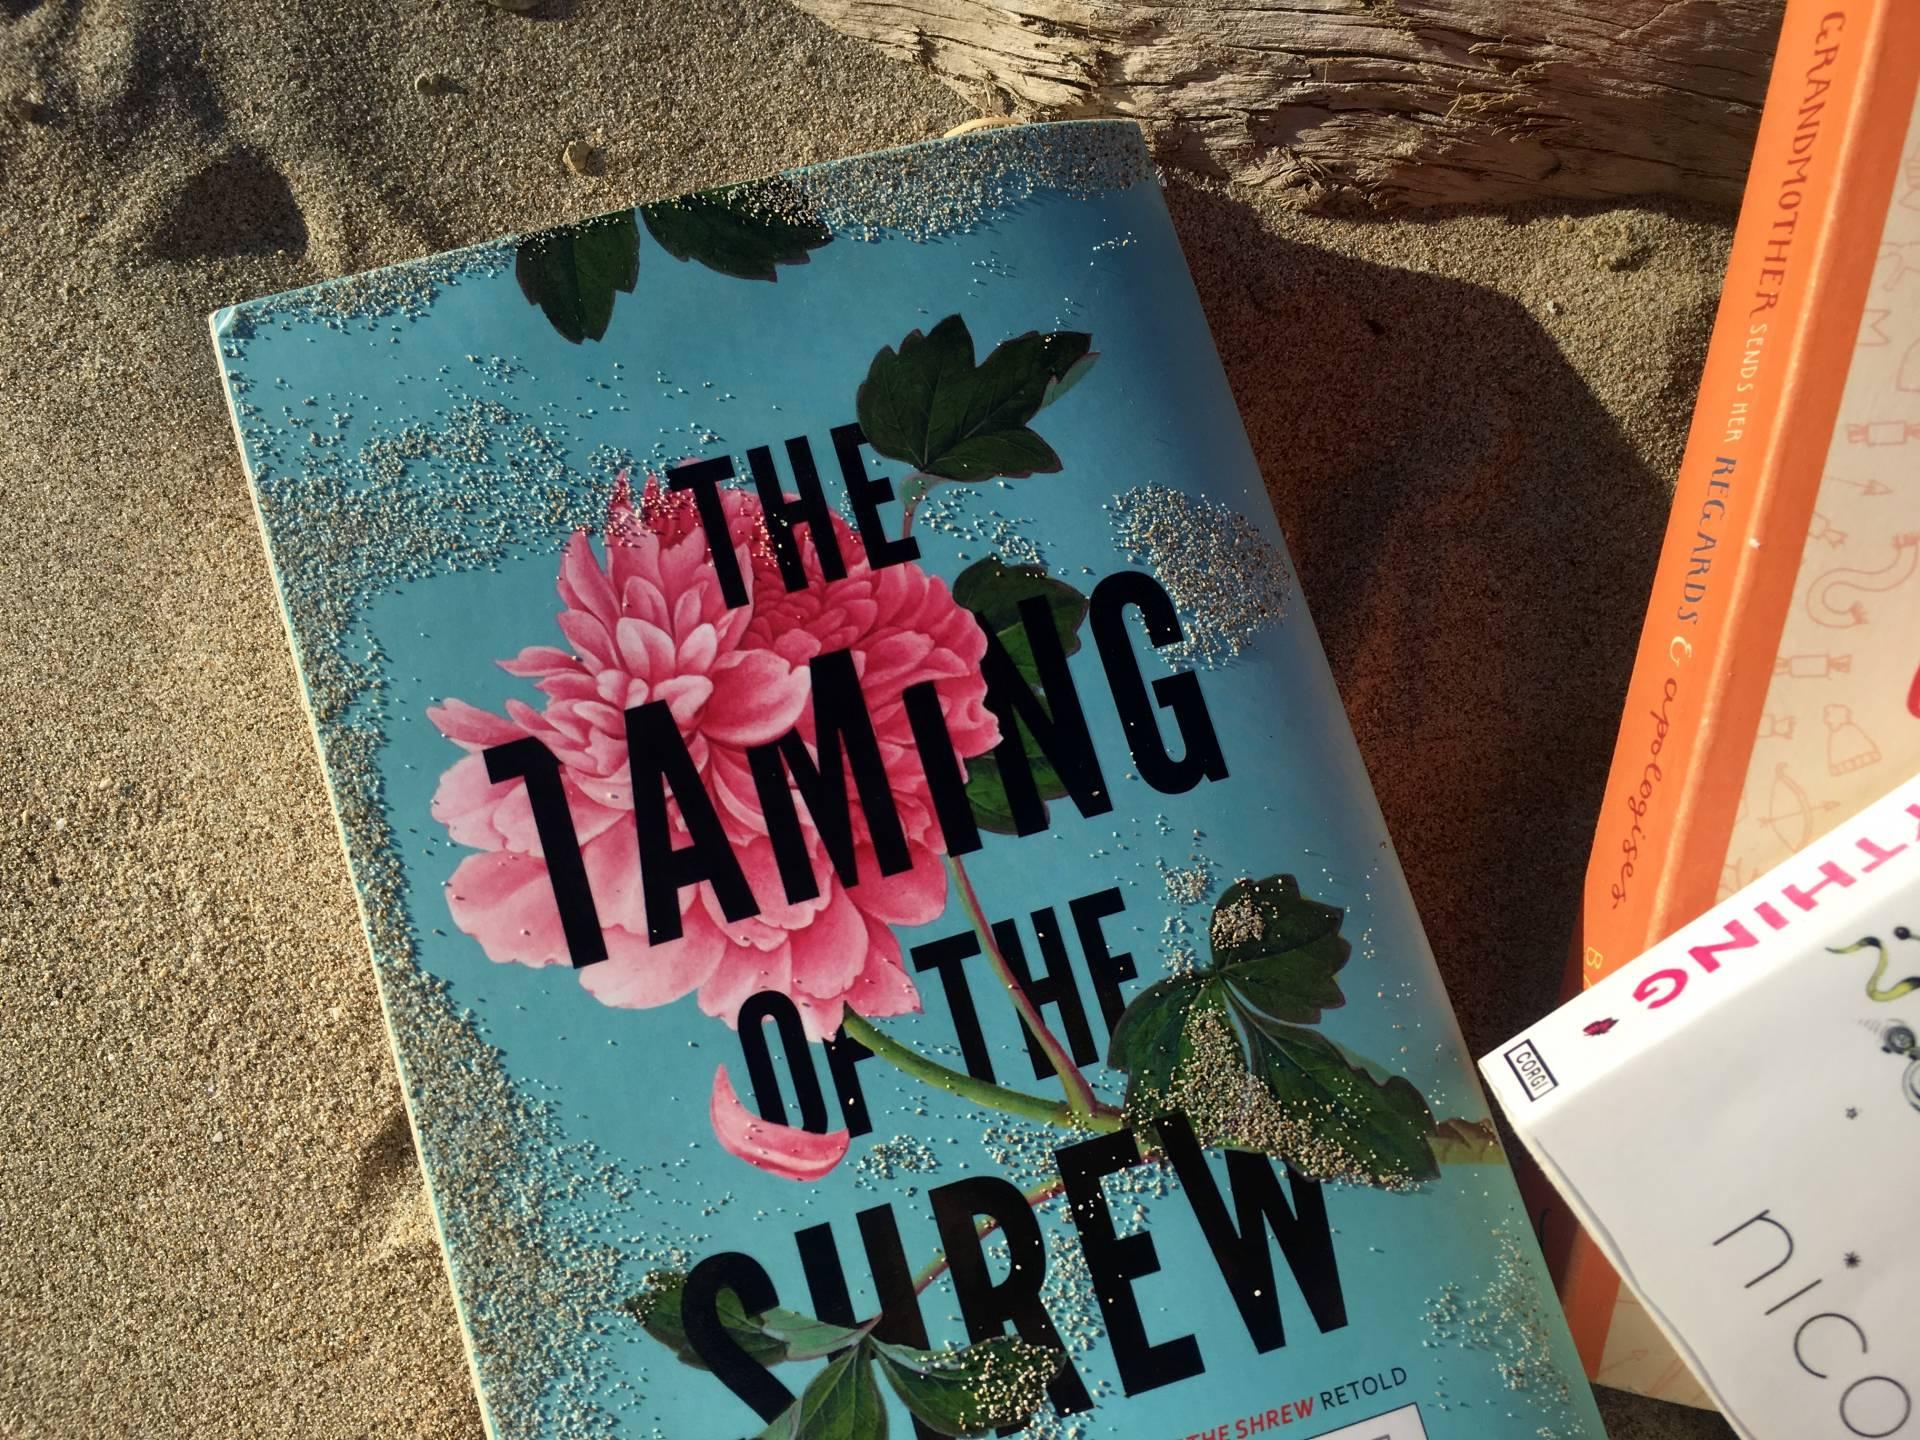 Top 5 Books - Summer 2016 | Megan Taylor